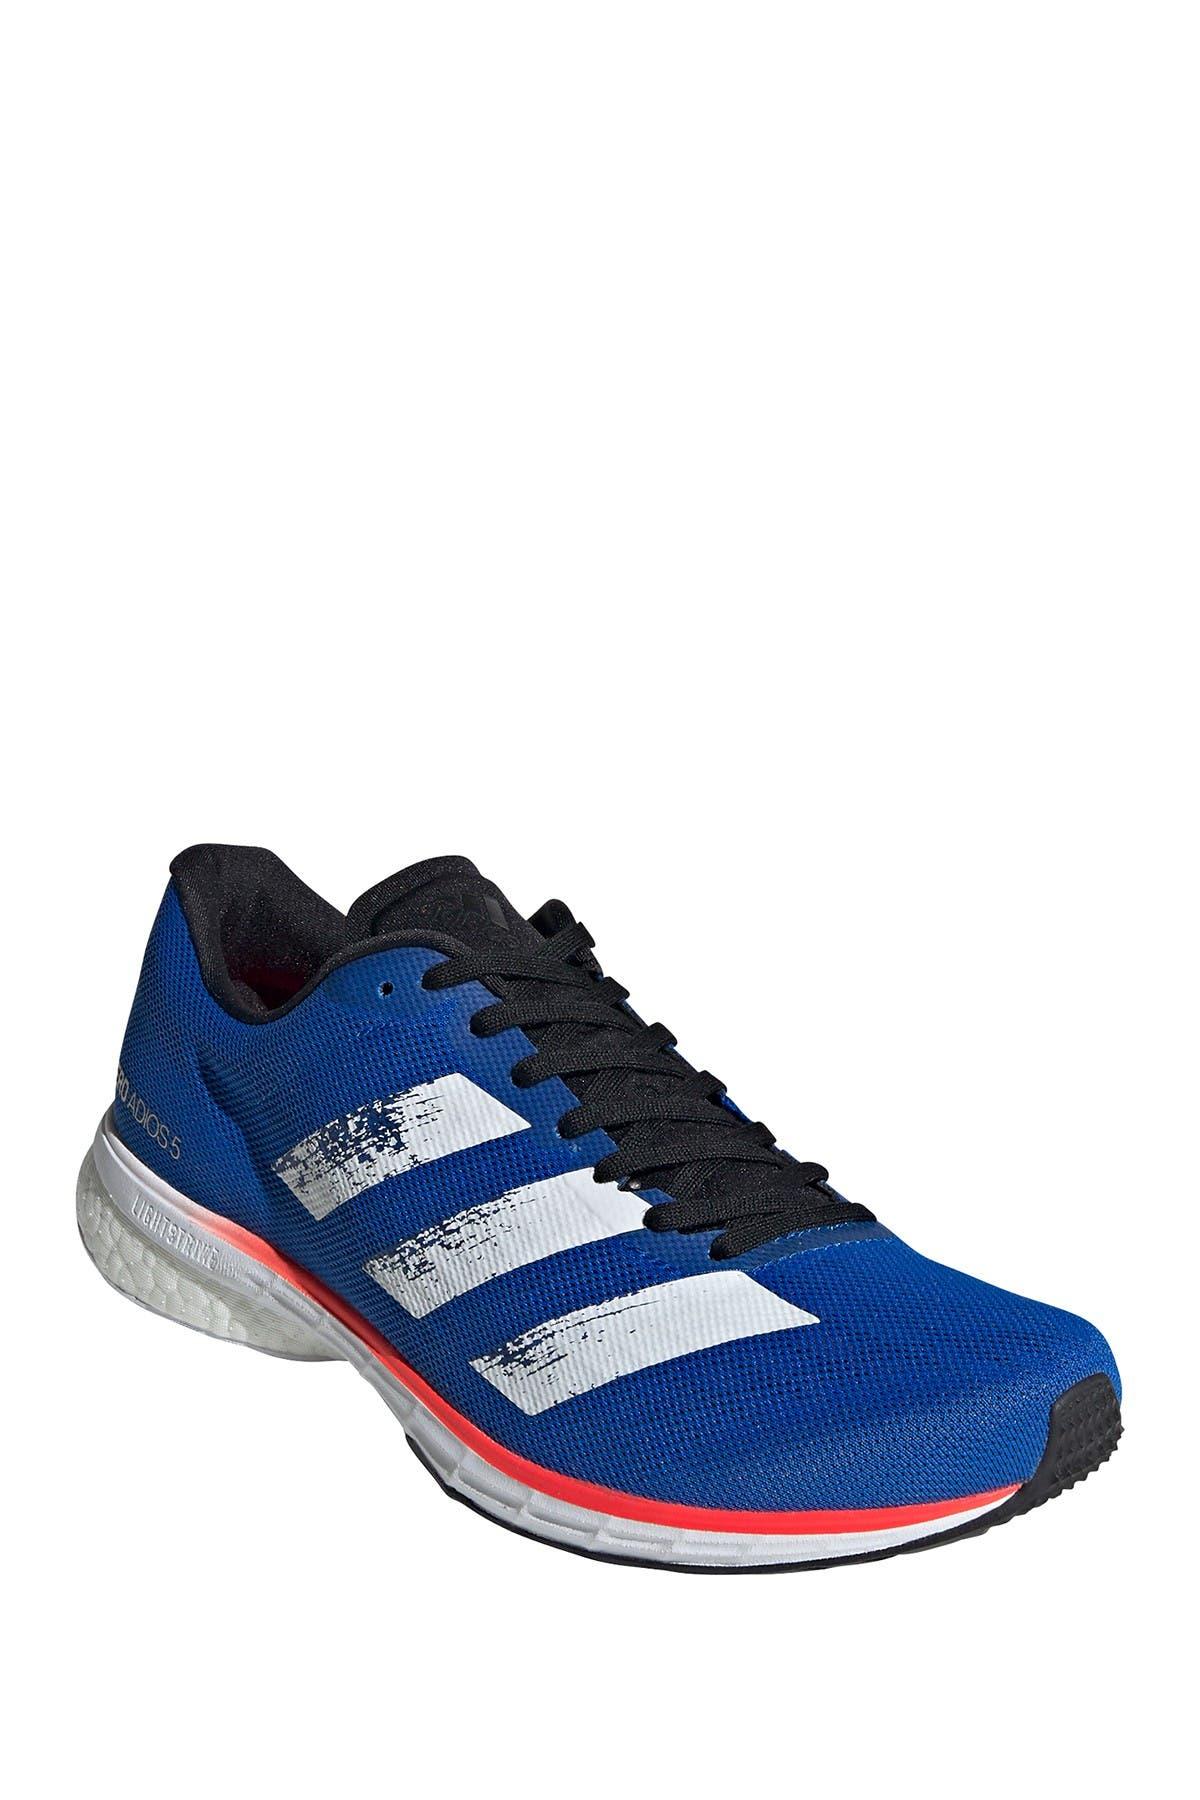 Image of adidas Adizero Adios 5 Running Shoe